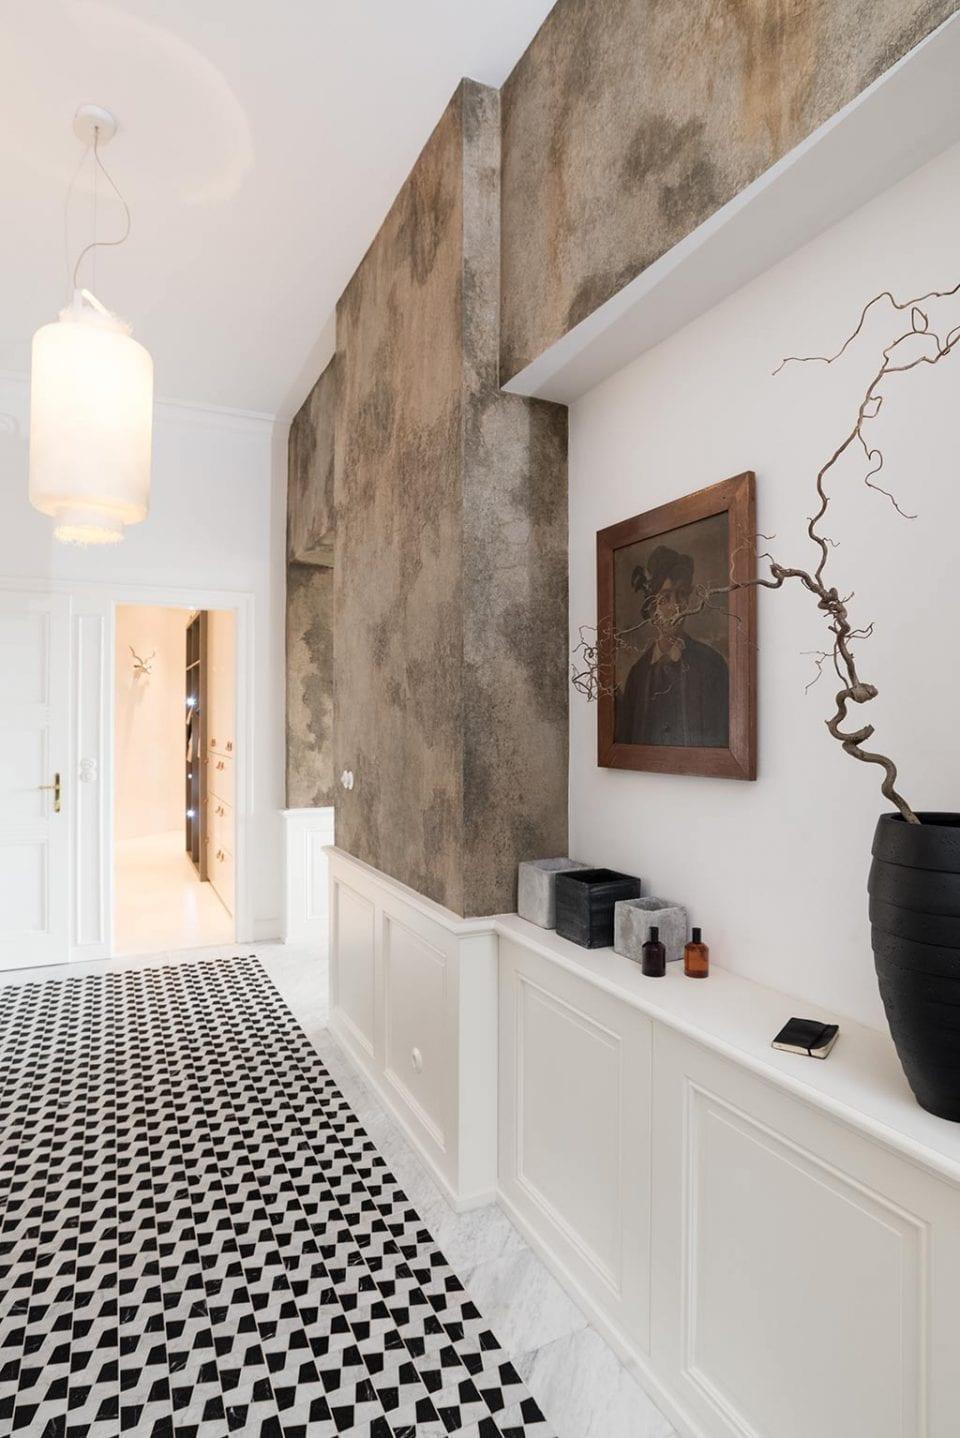 PN8 960x1438 - Look Inside: 1930s Czech Republic Apartment Re-invisioned